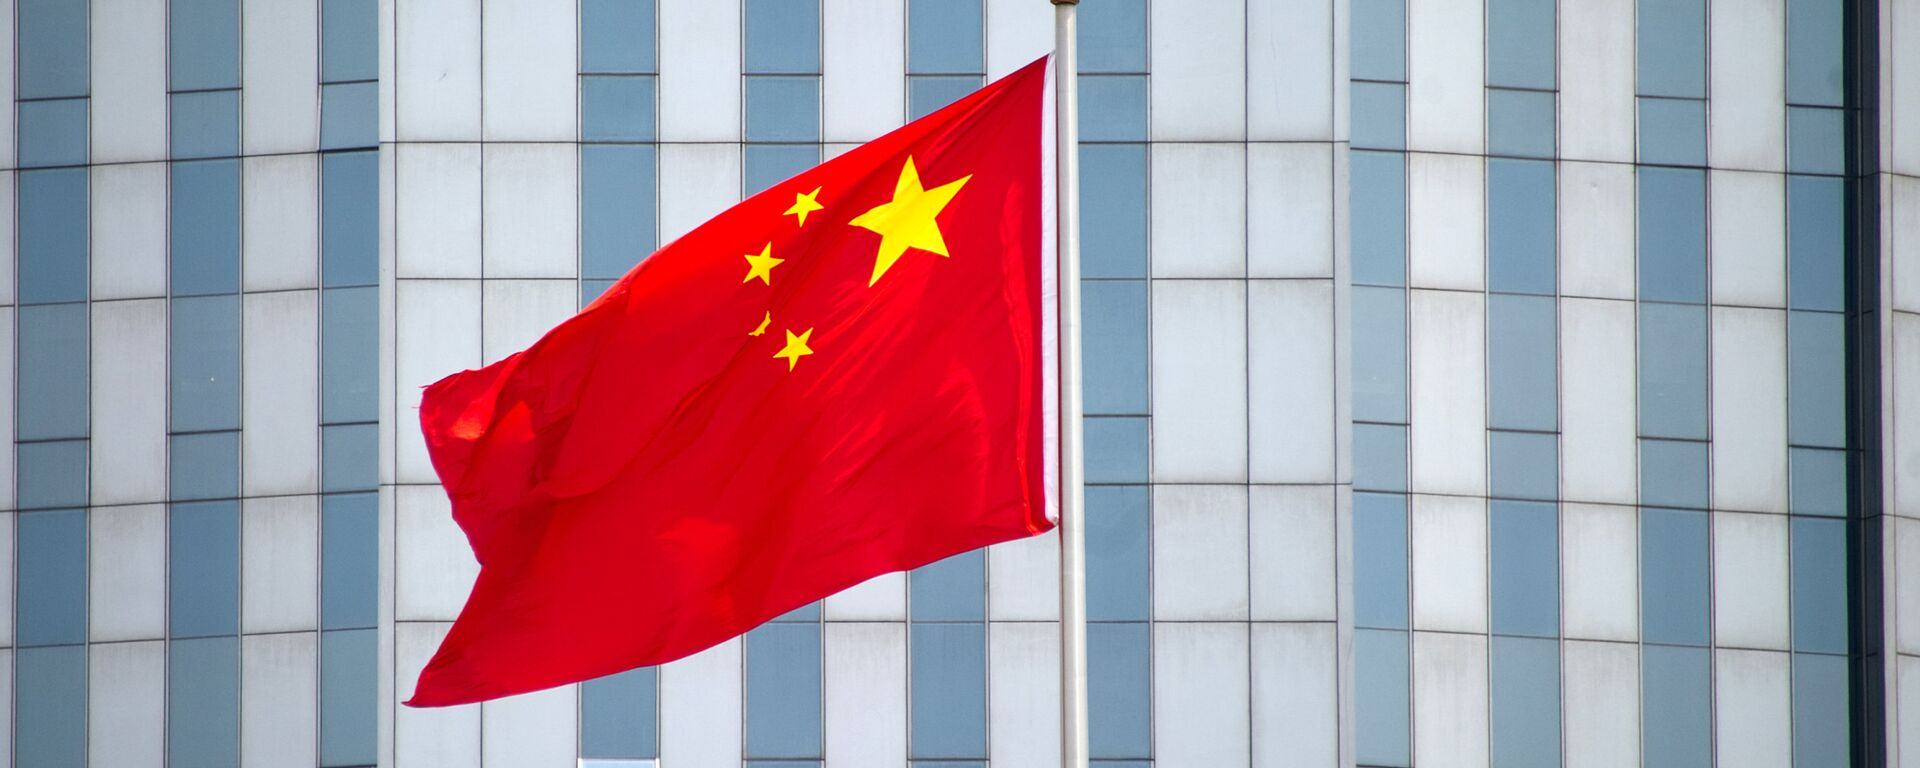 Bandera de China - Sputnik Mundo, 1920, 12.08.2021